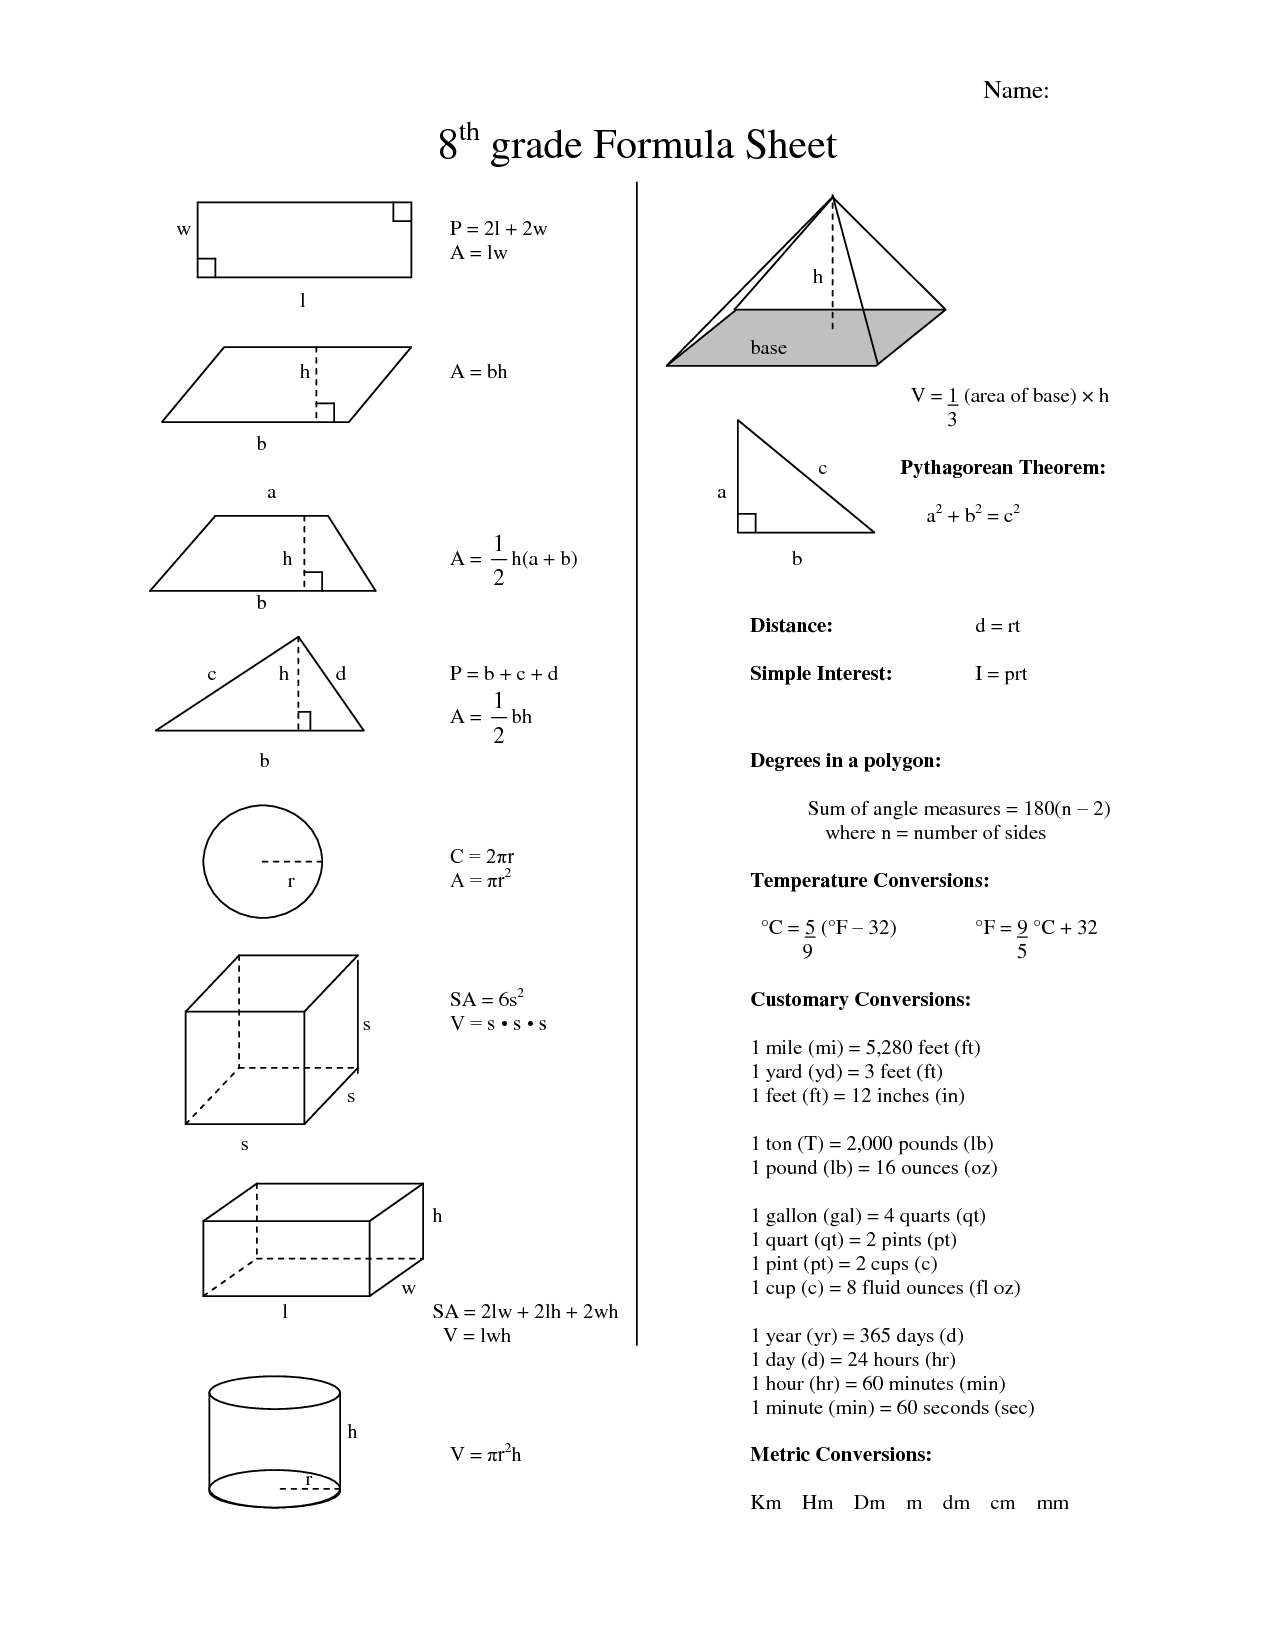 Eighth Grade Math Formula Chart   8th grade Formula Sheet   Math formulas [ 1650 x 1275 Pixel ]